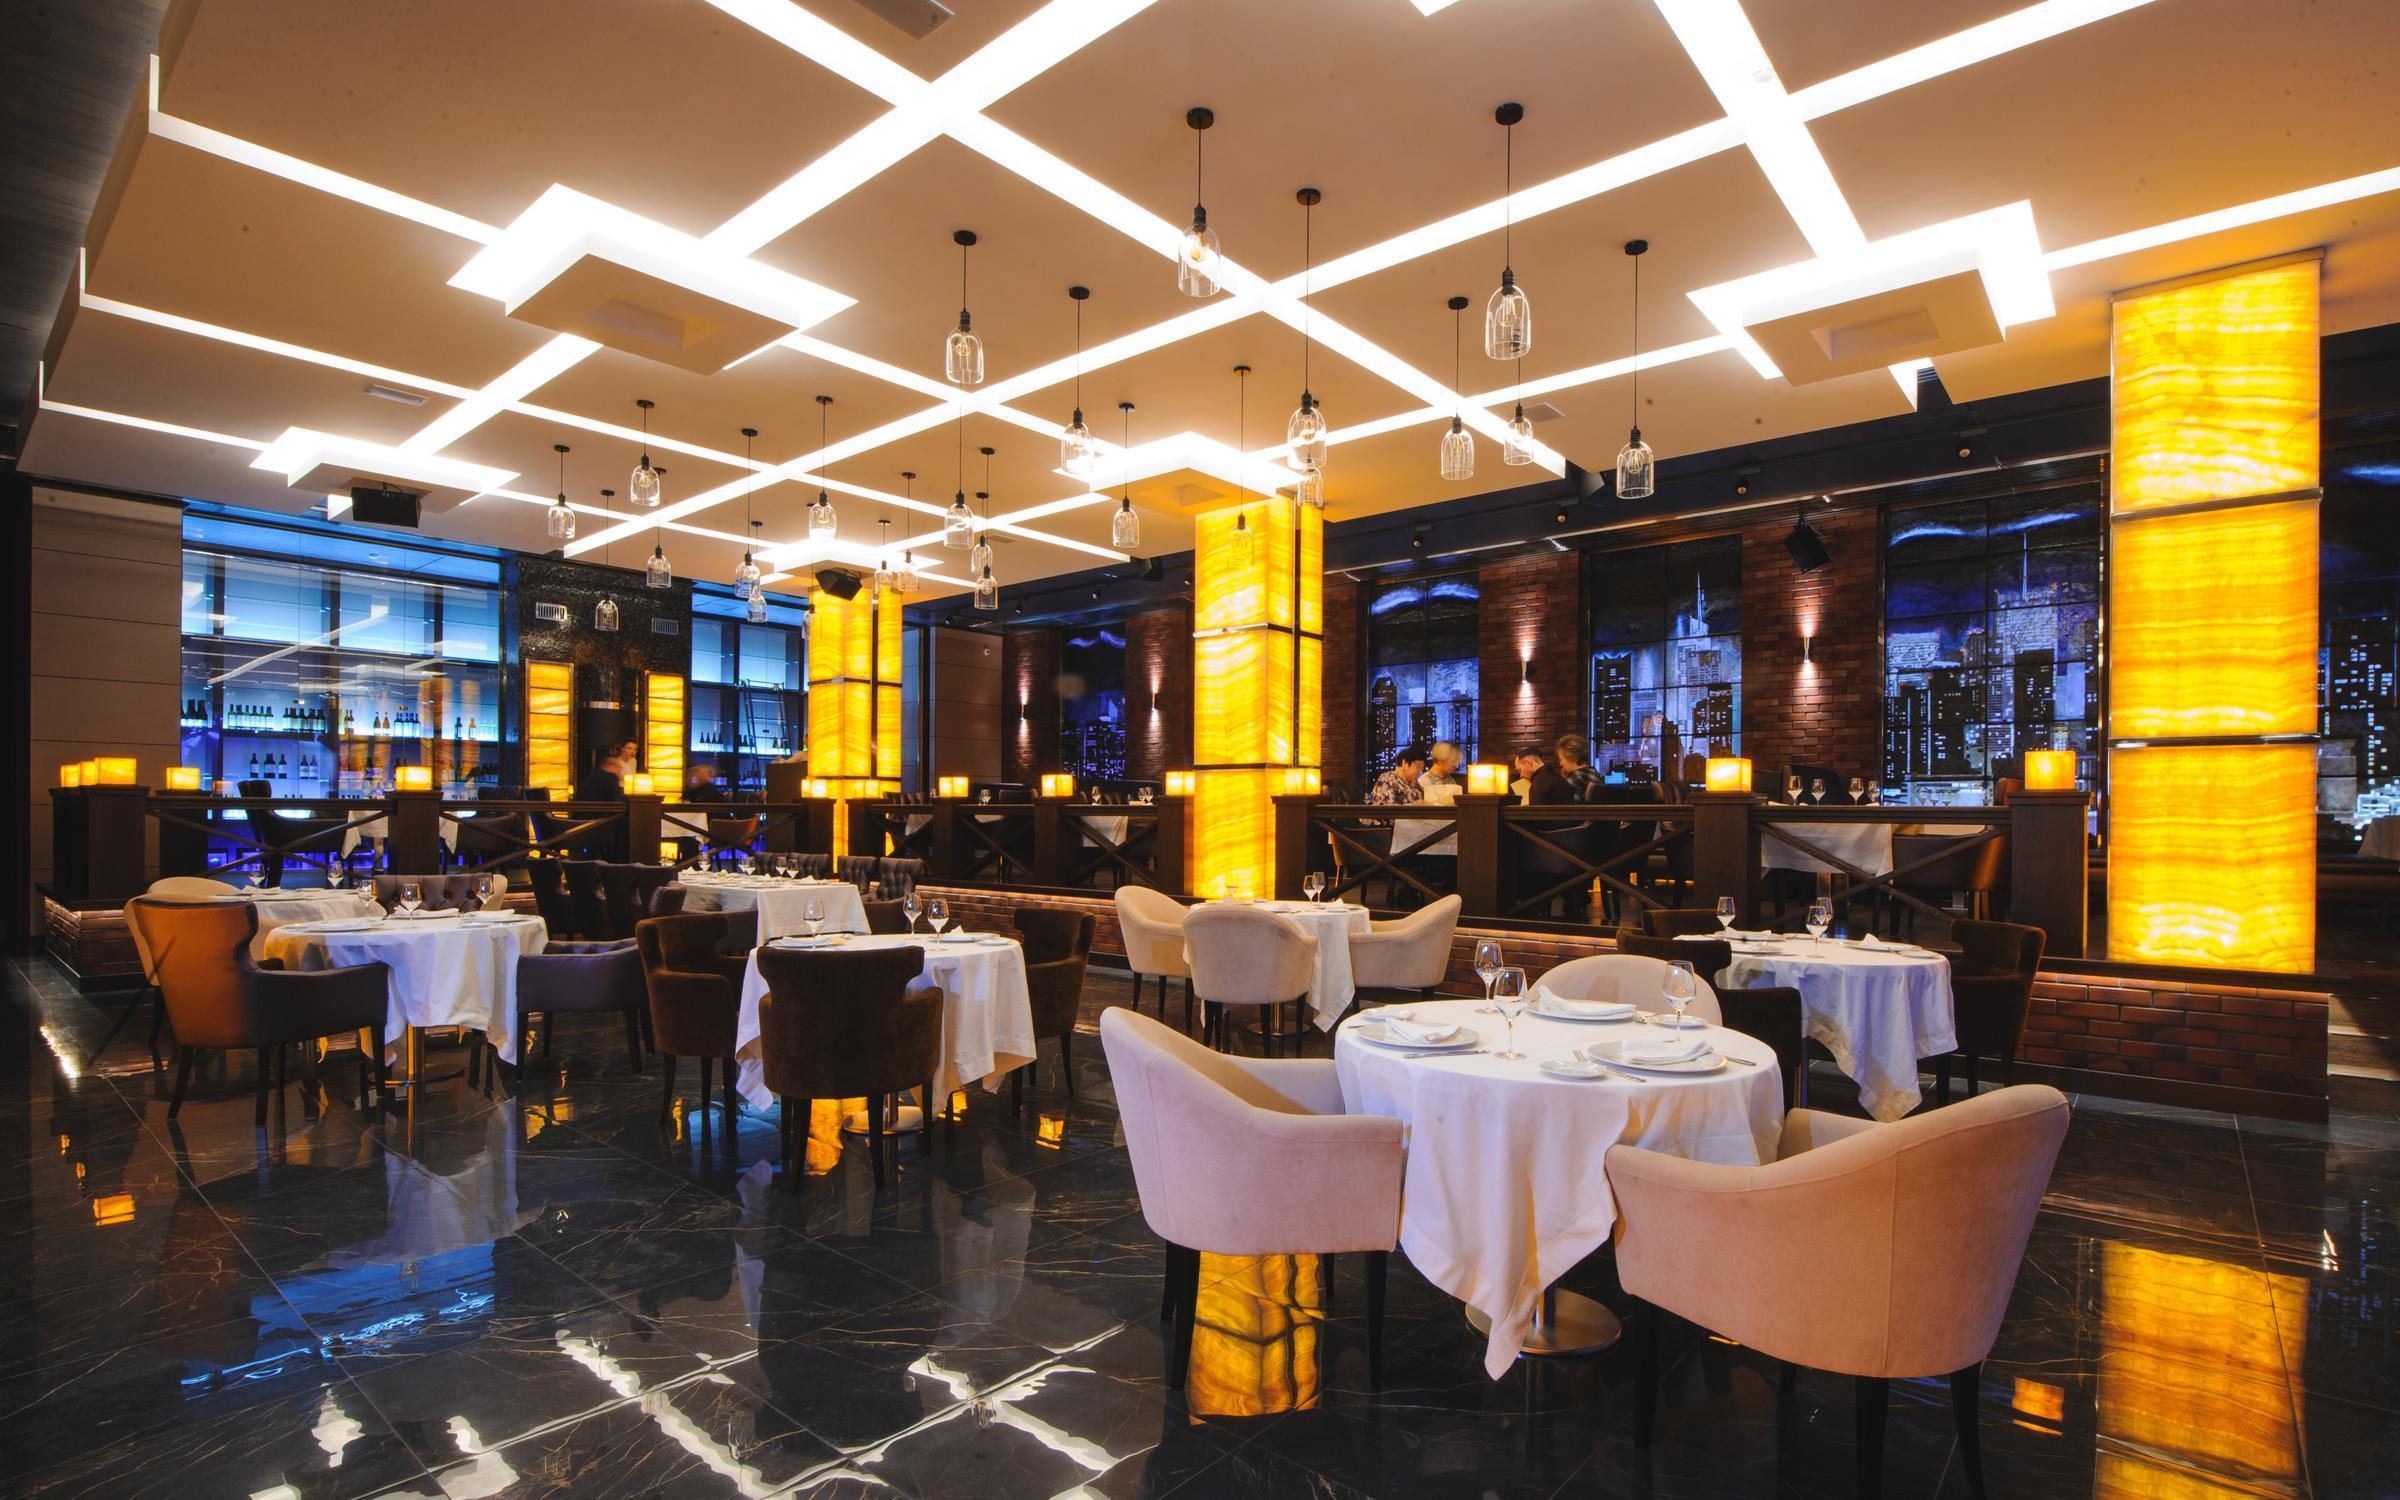 фотография Ресторана-клуба Оскар на улице Дианова